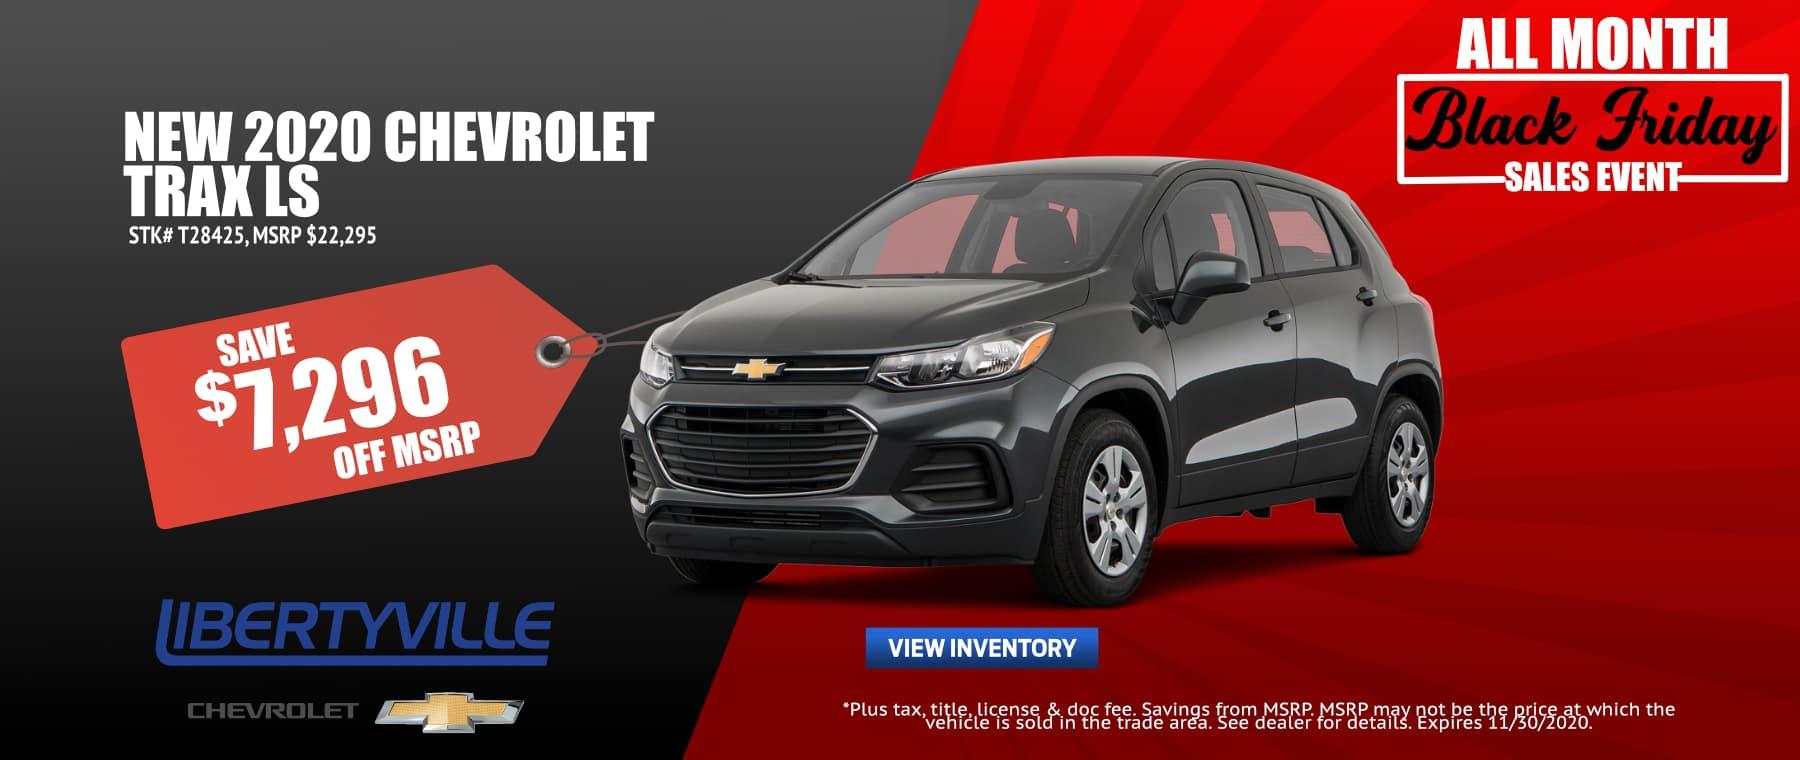 November-2020_TRAX_LIbertyville Chevrolet